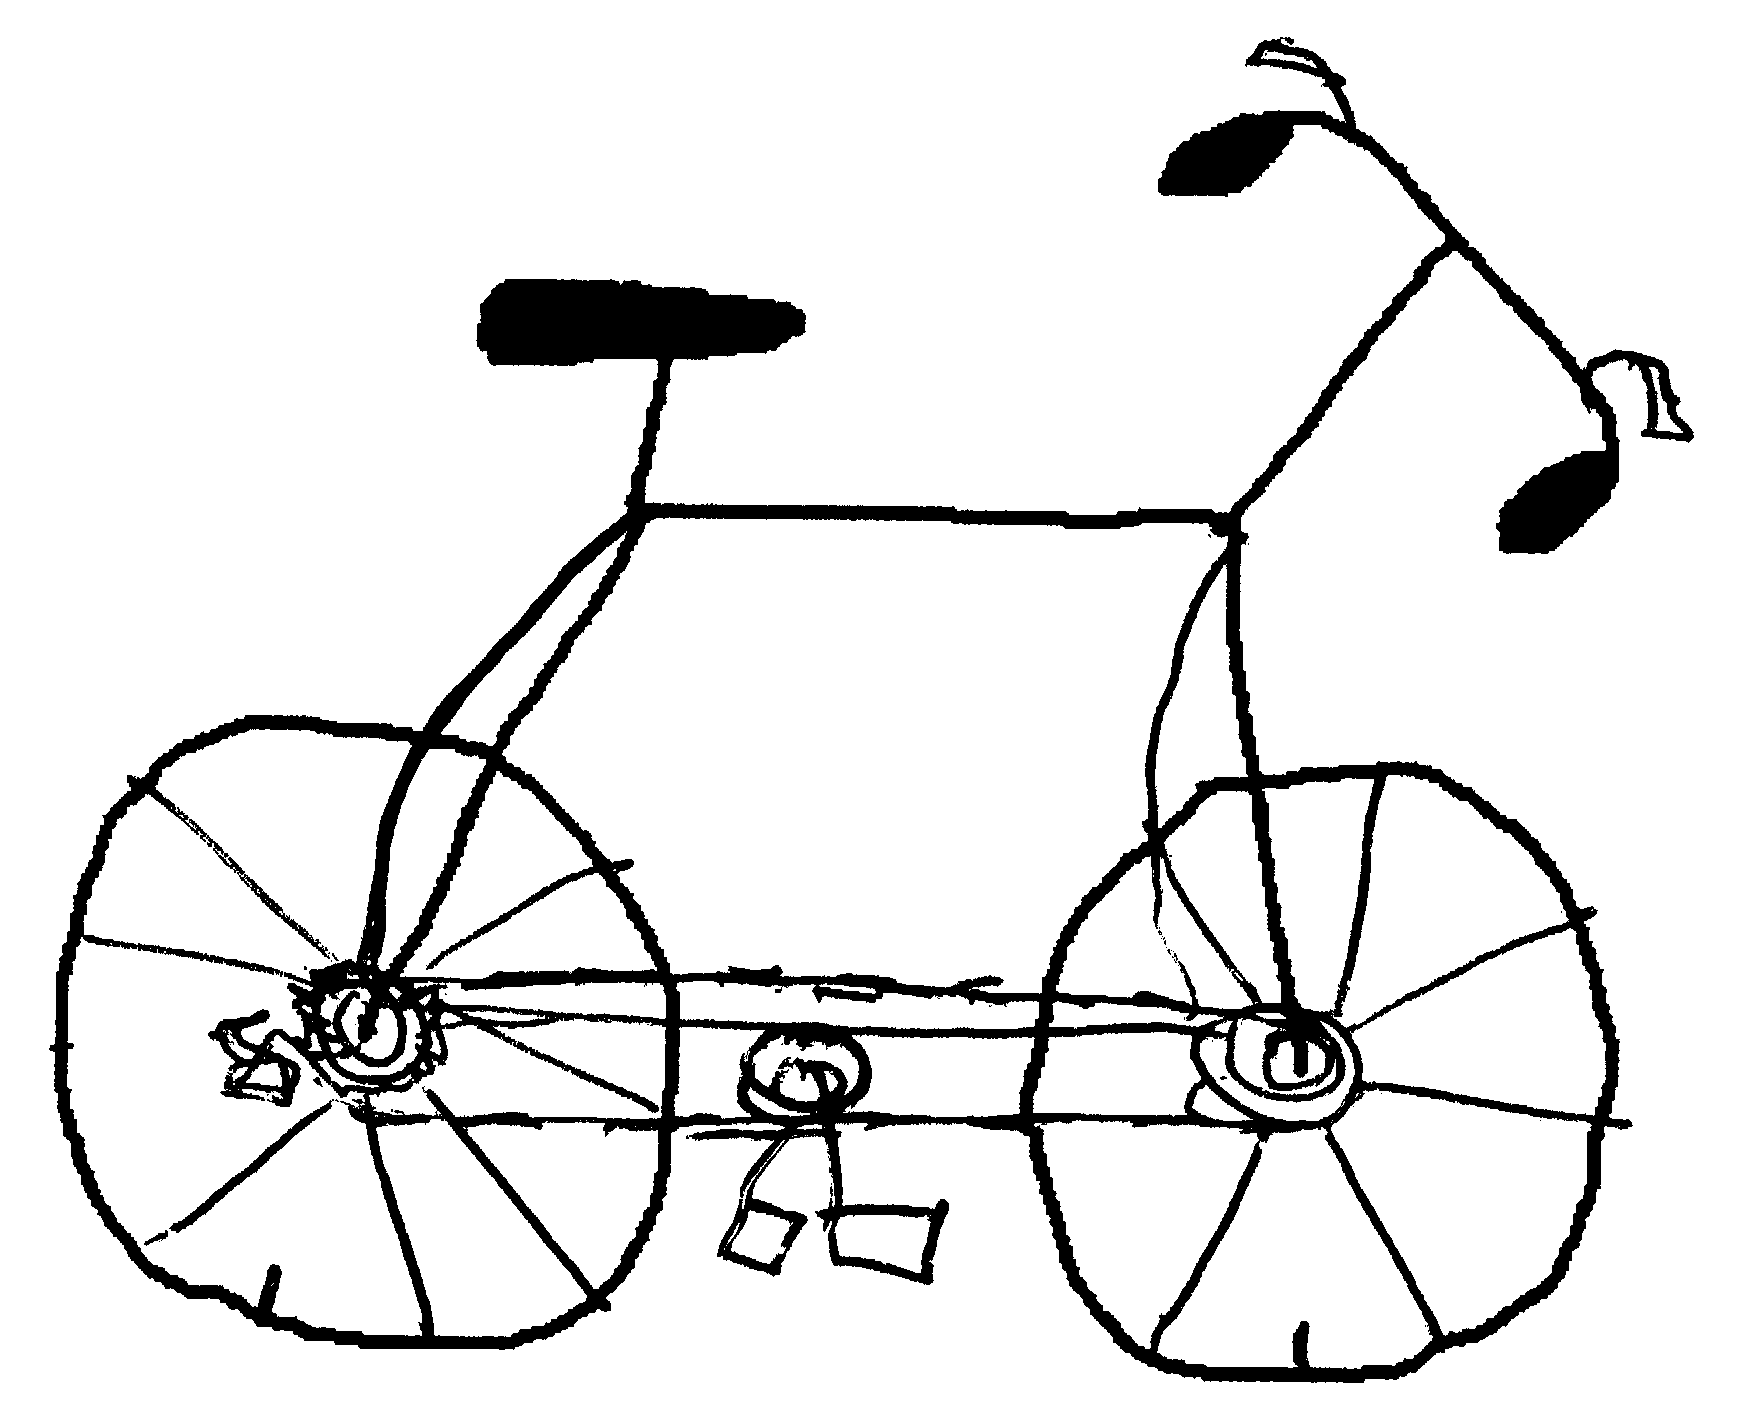 Bicycle Parts Drawing